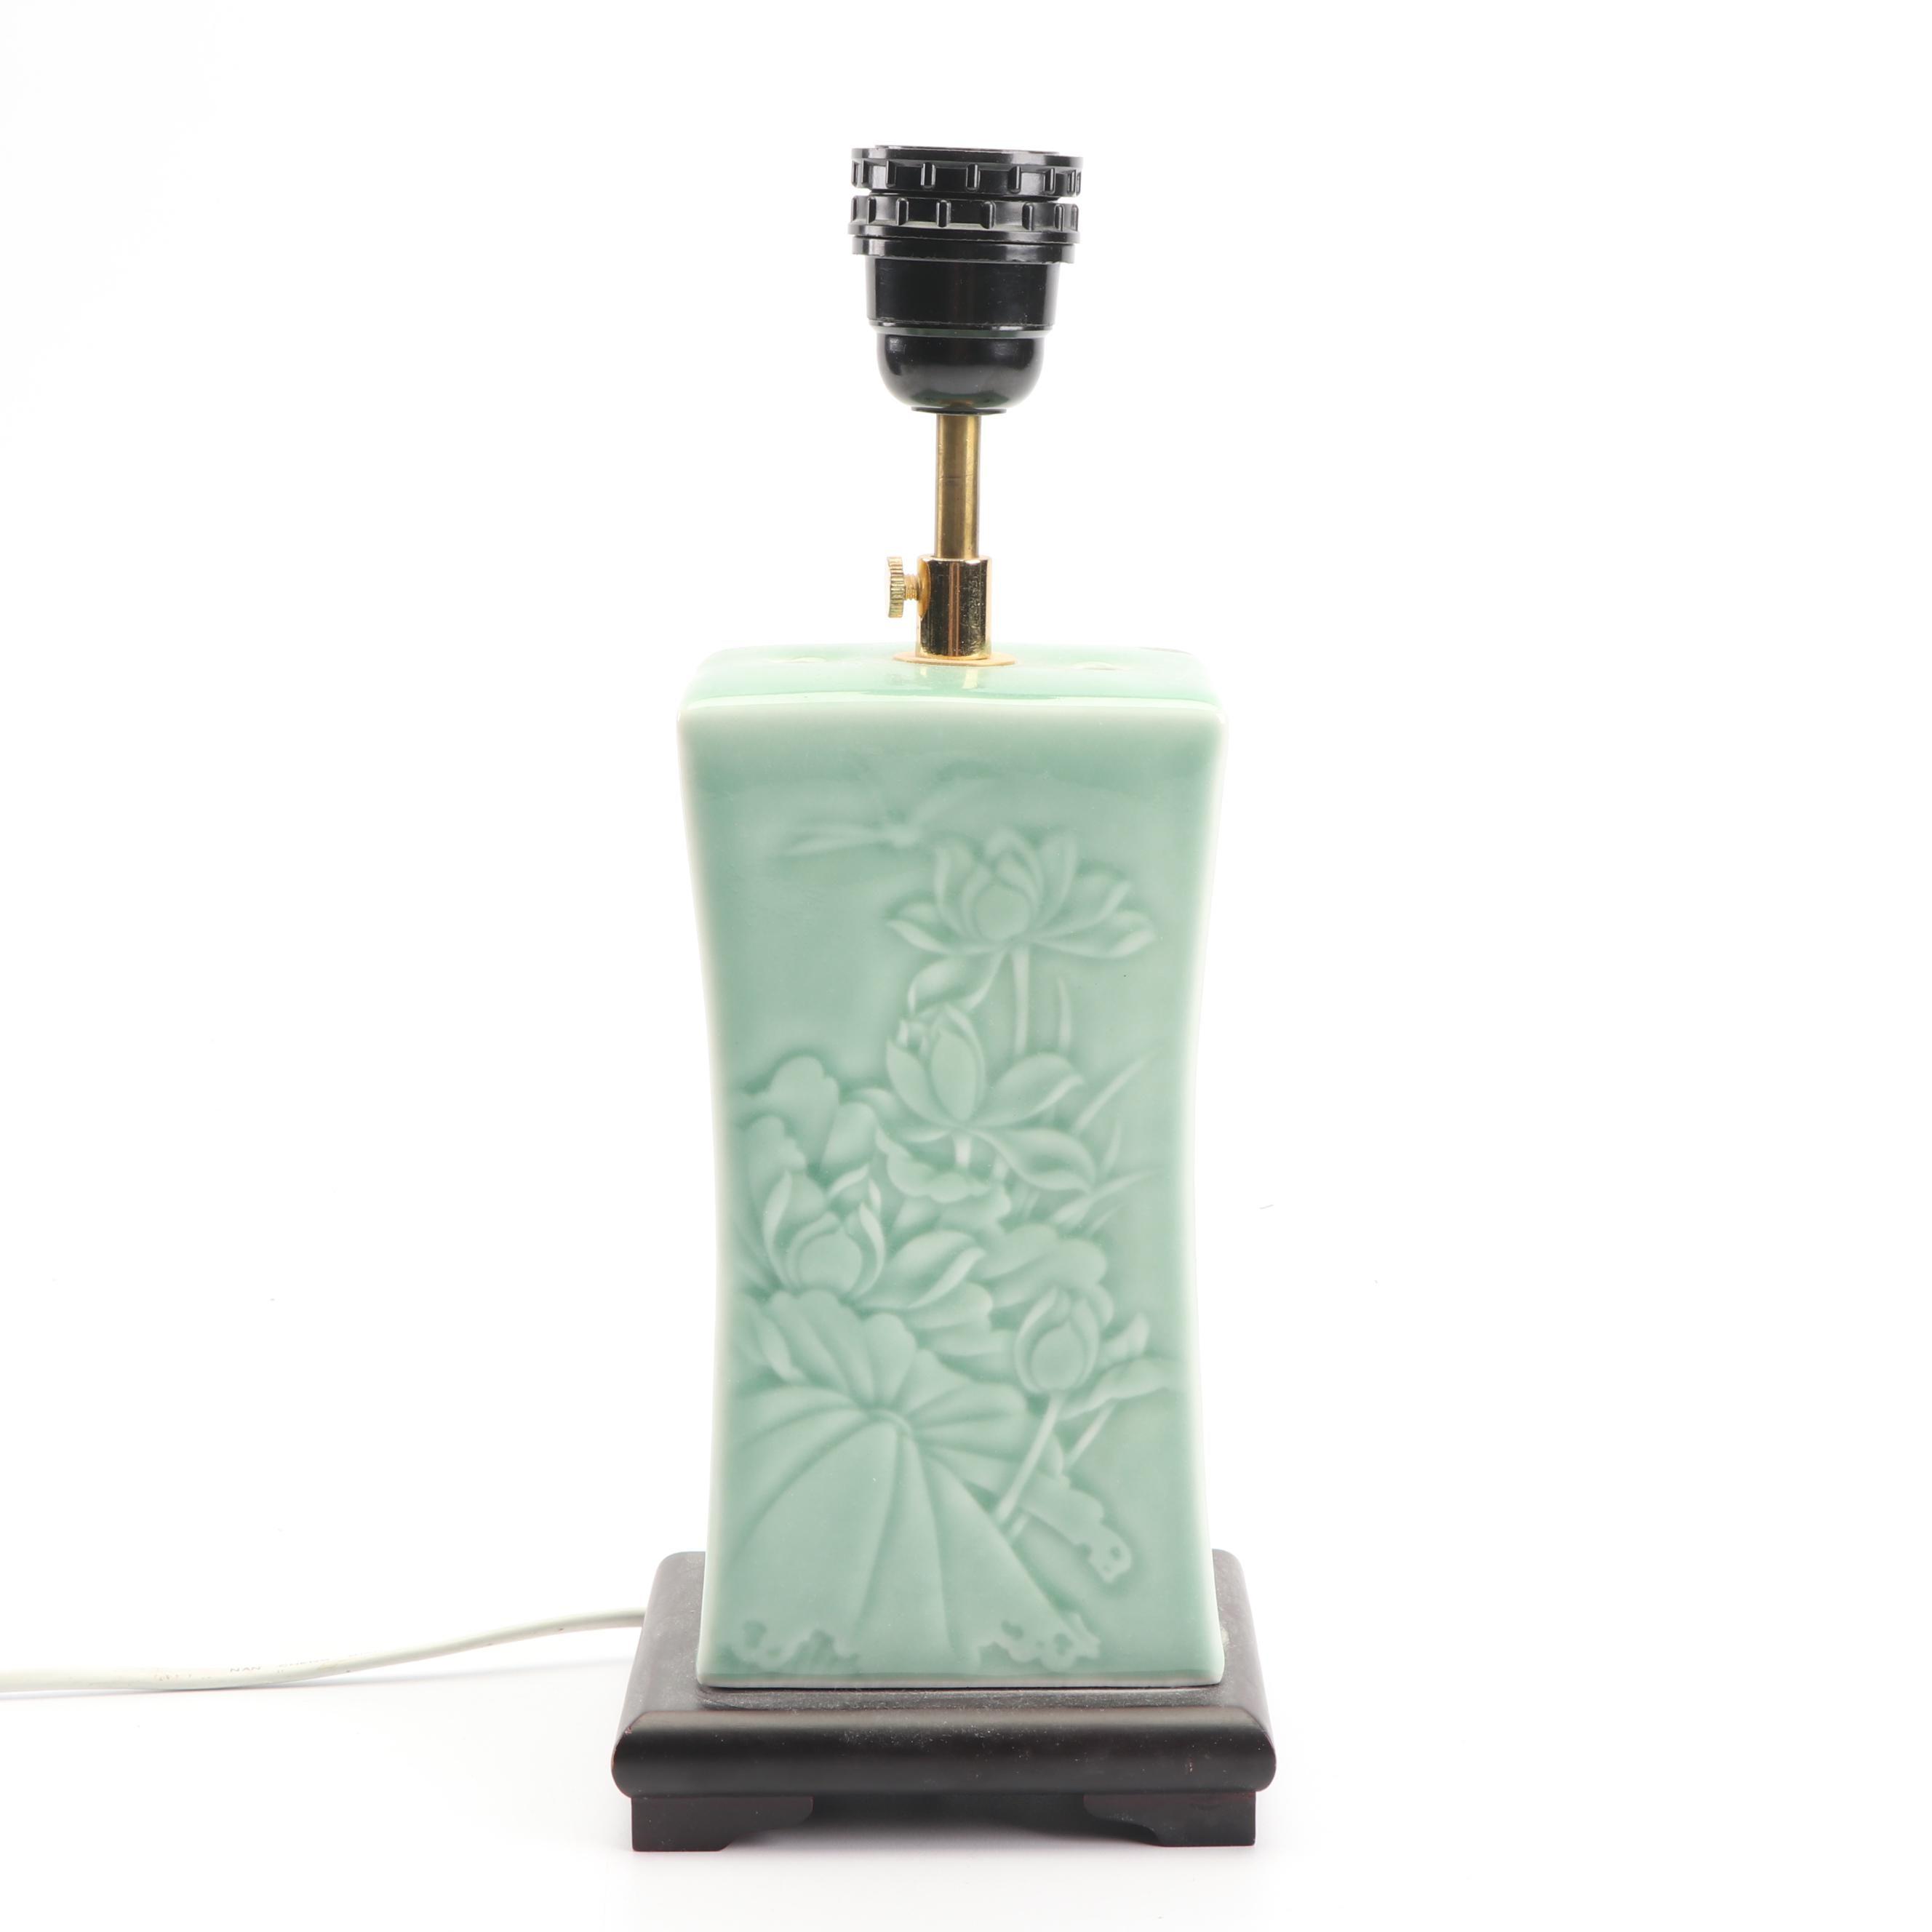 Chinese Green Celadon Glaze Ceramic Lamp Marked with Auspicious Idiom